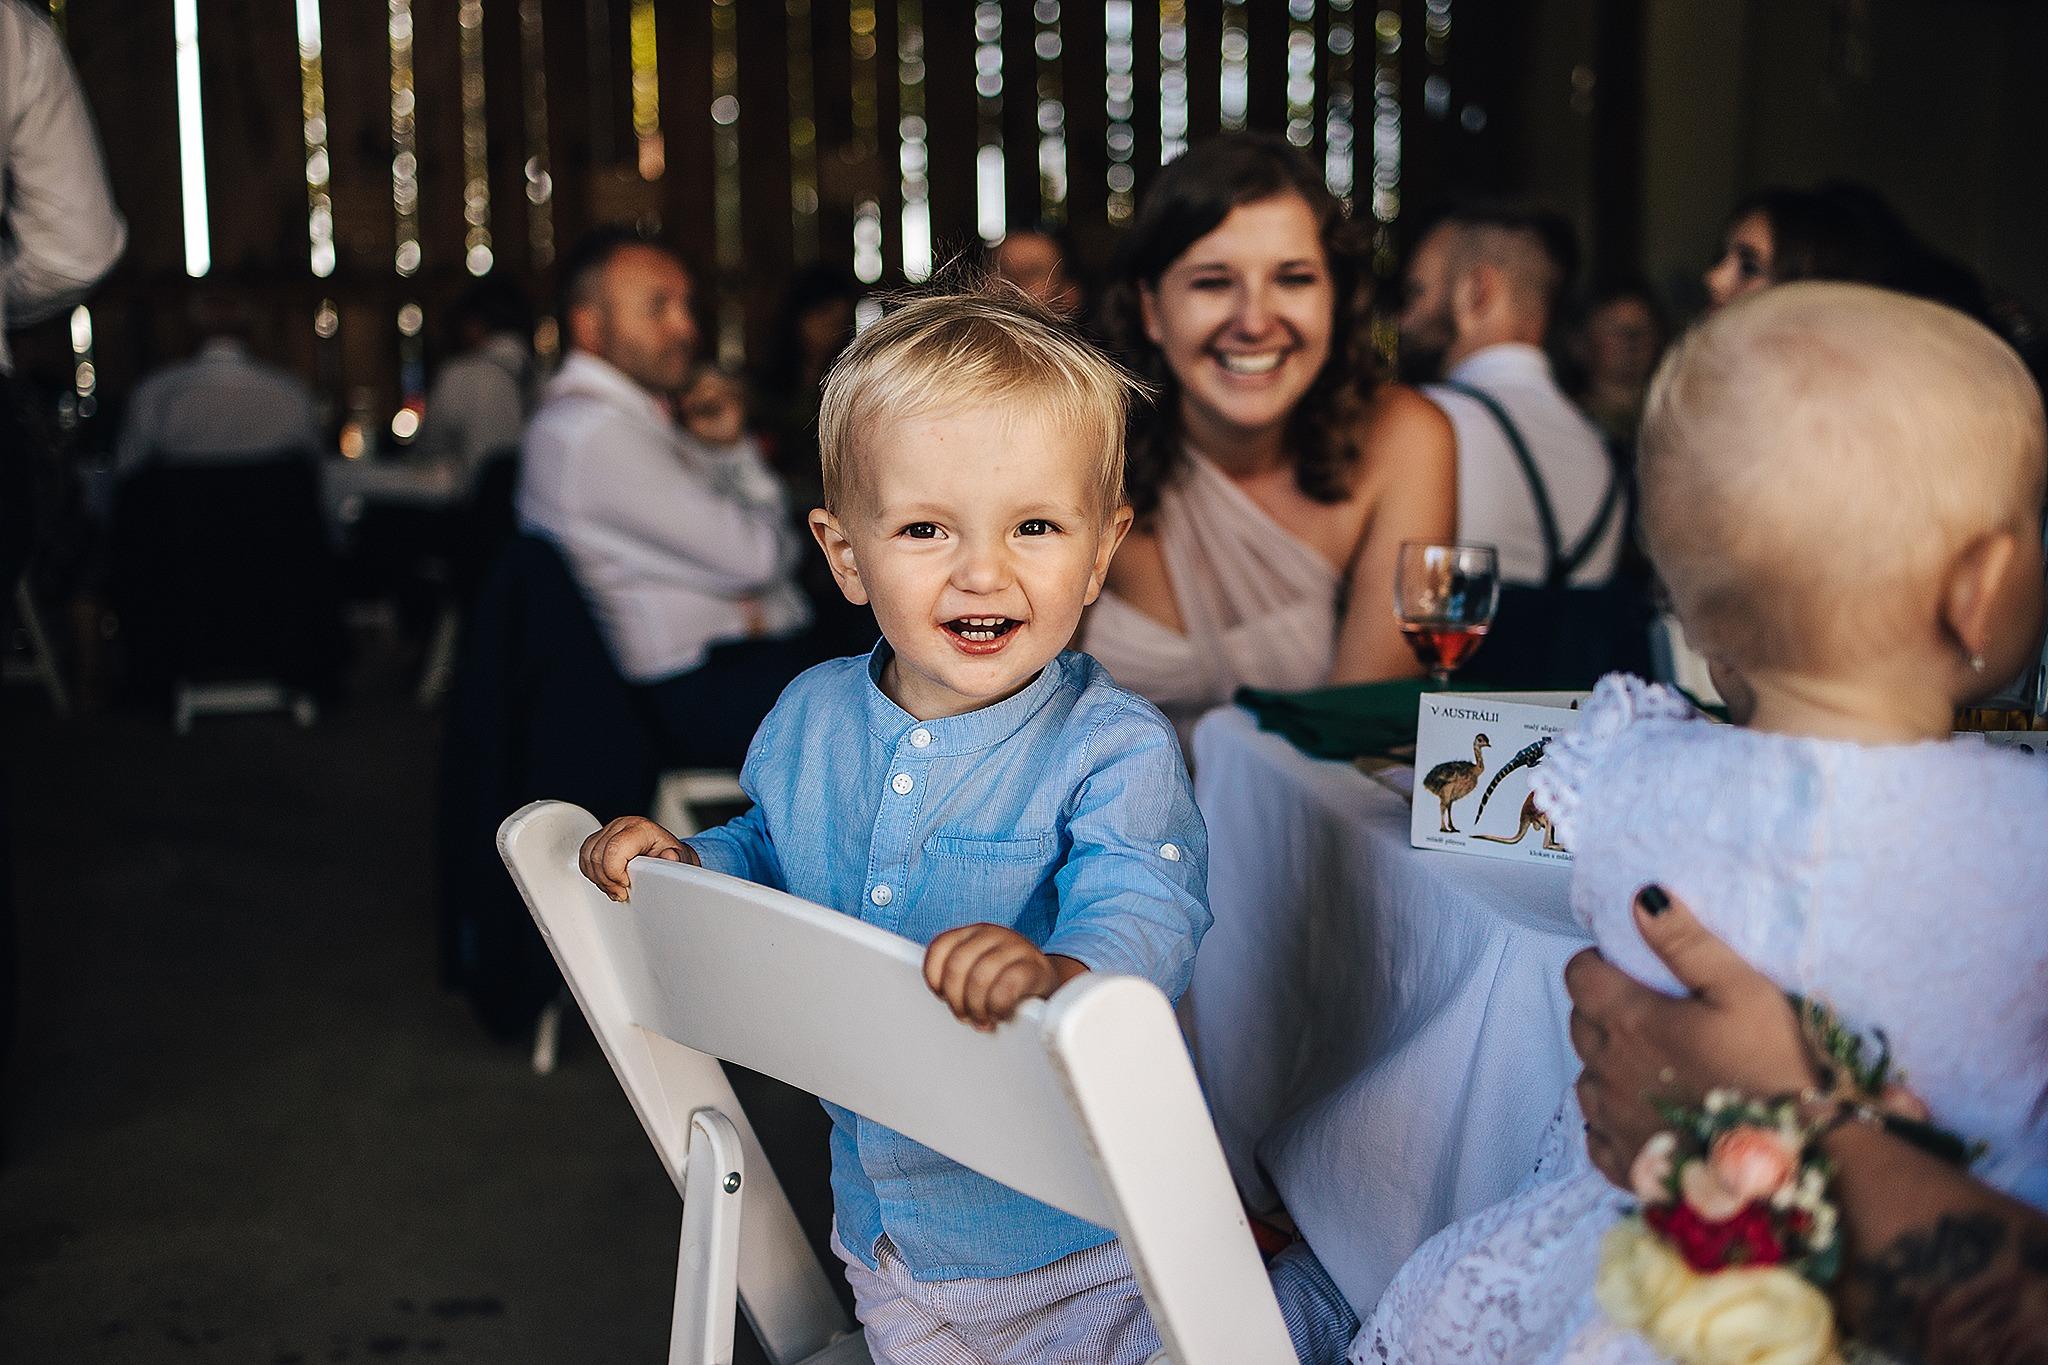 stodola svatba jičín